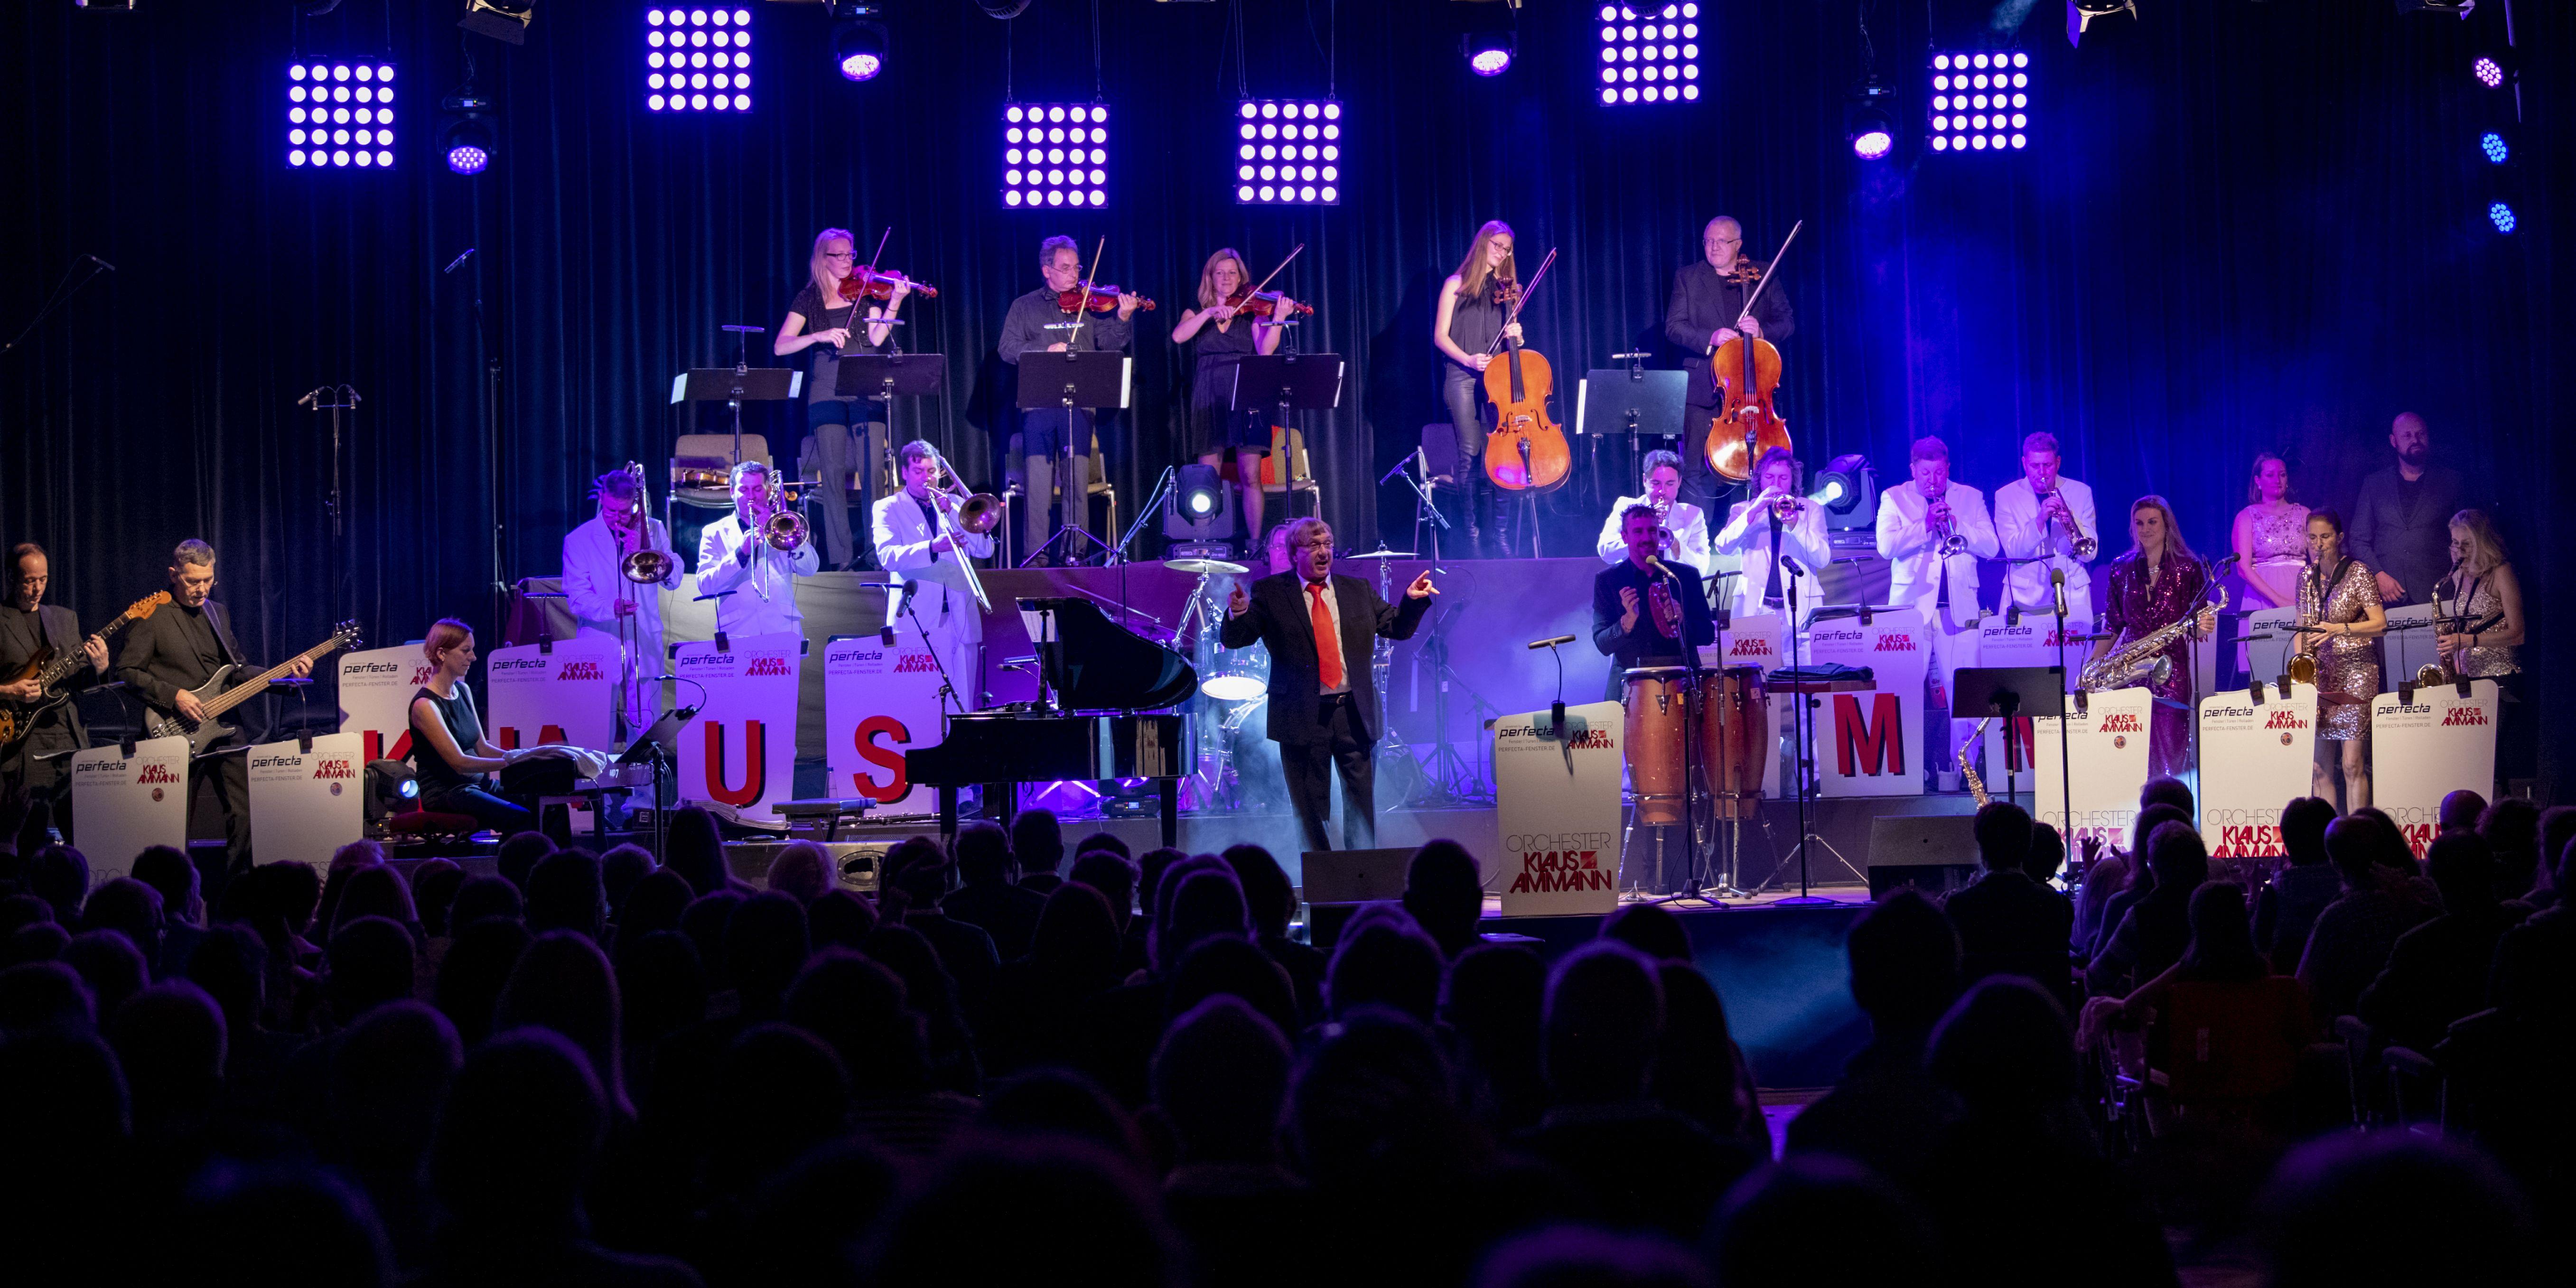 Berchtesgaden, Deutschland, Kurhaus, 11.11.2018, Klaus Amman Big Band, Musik, Konzert, Udo Jürgens u. James Last